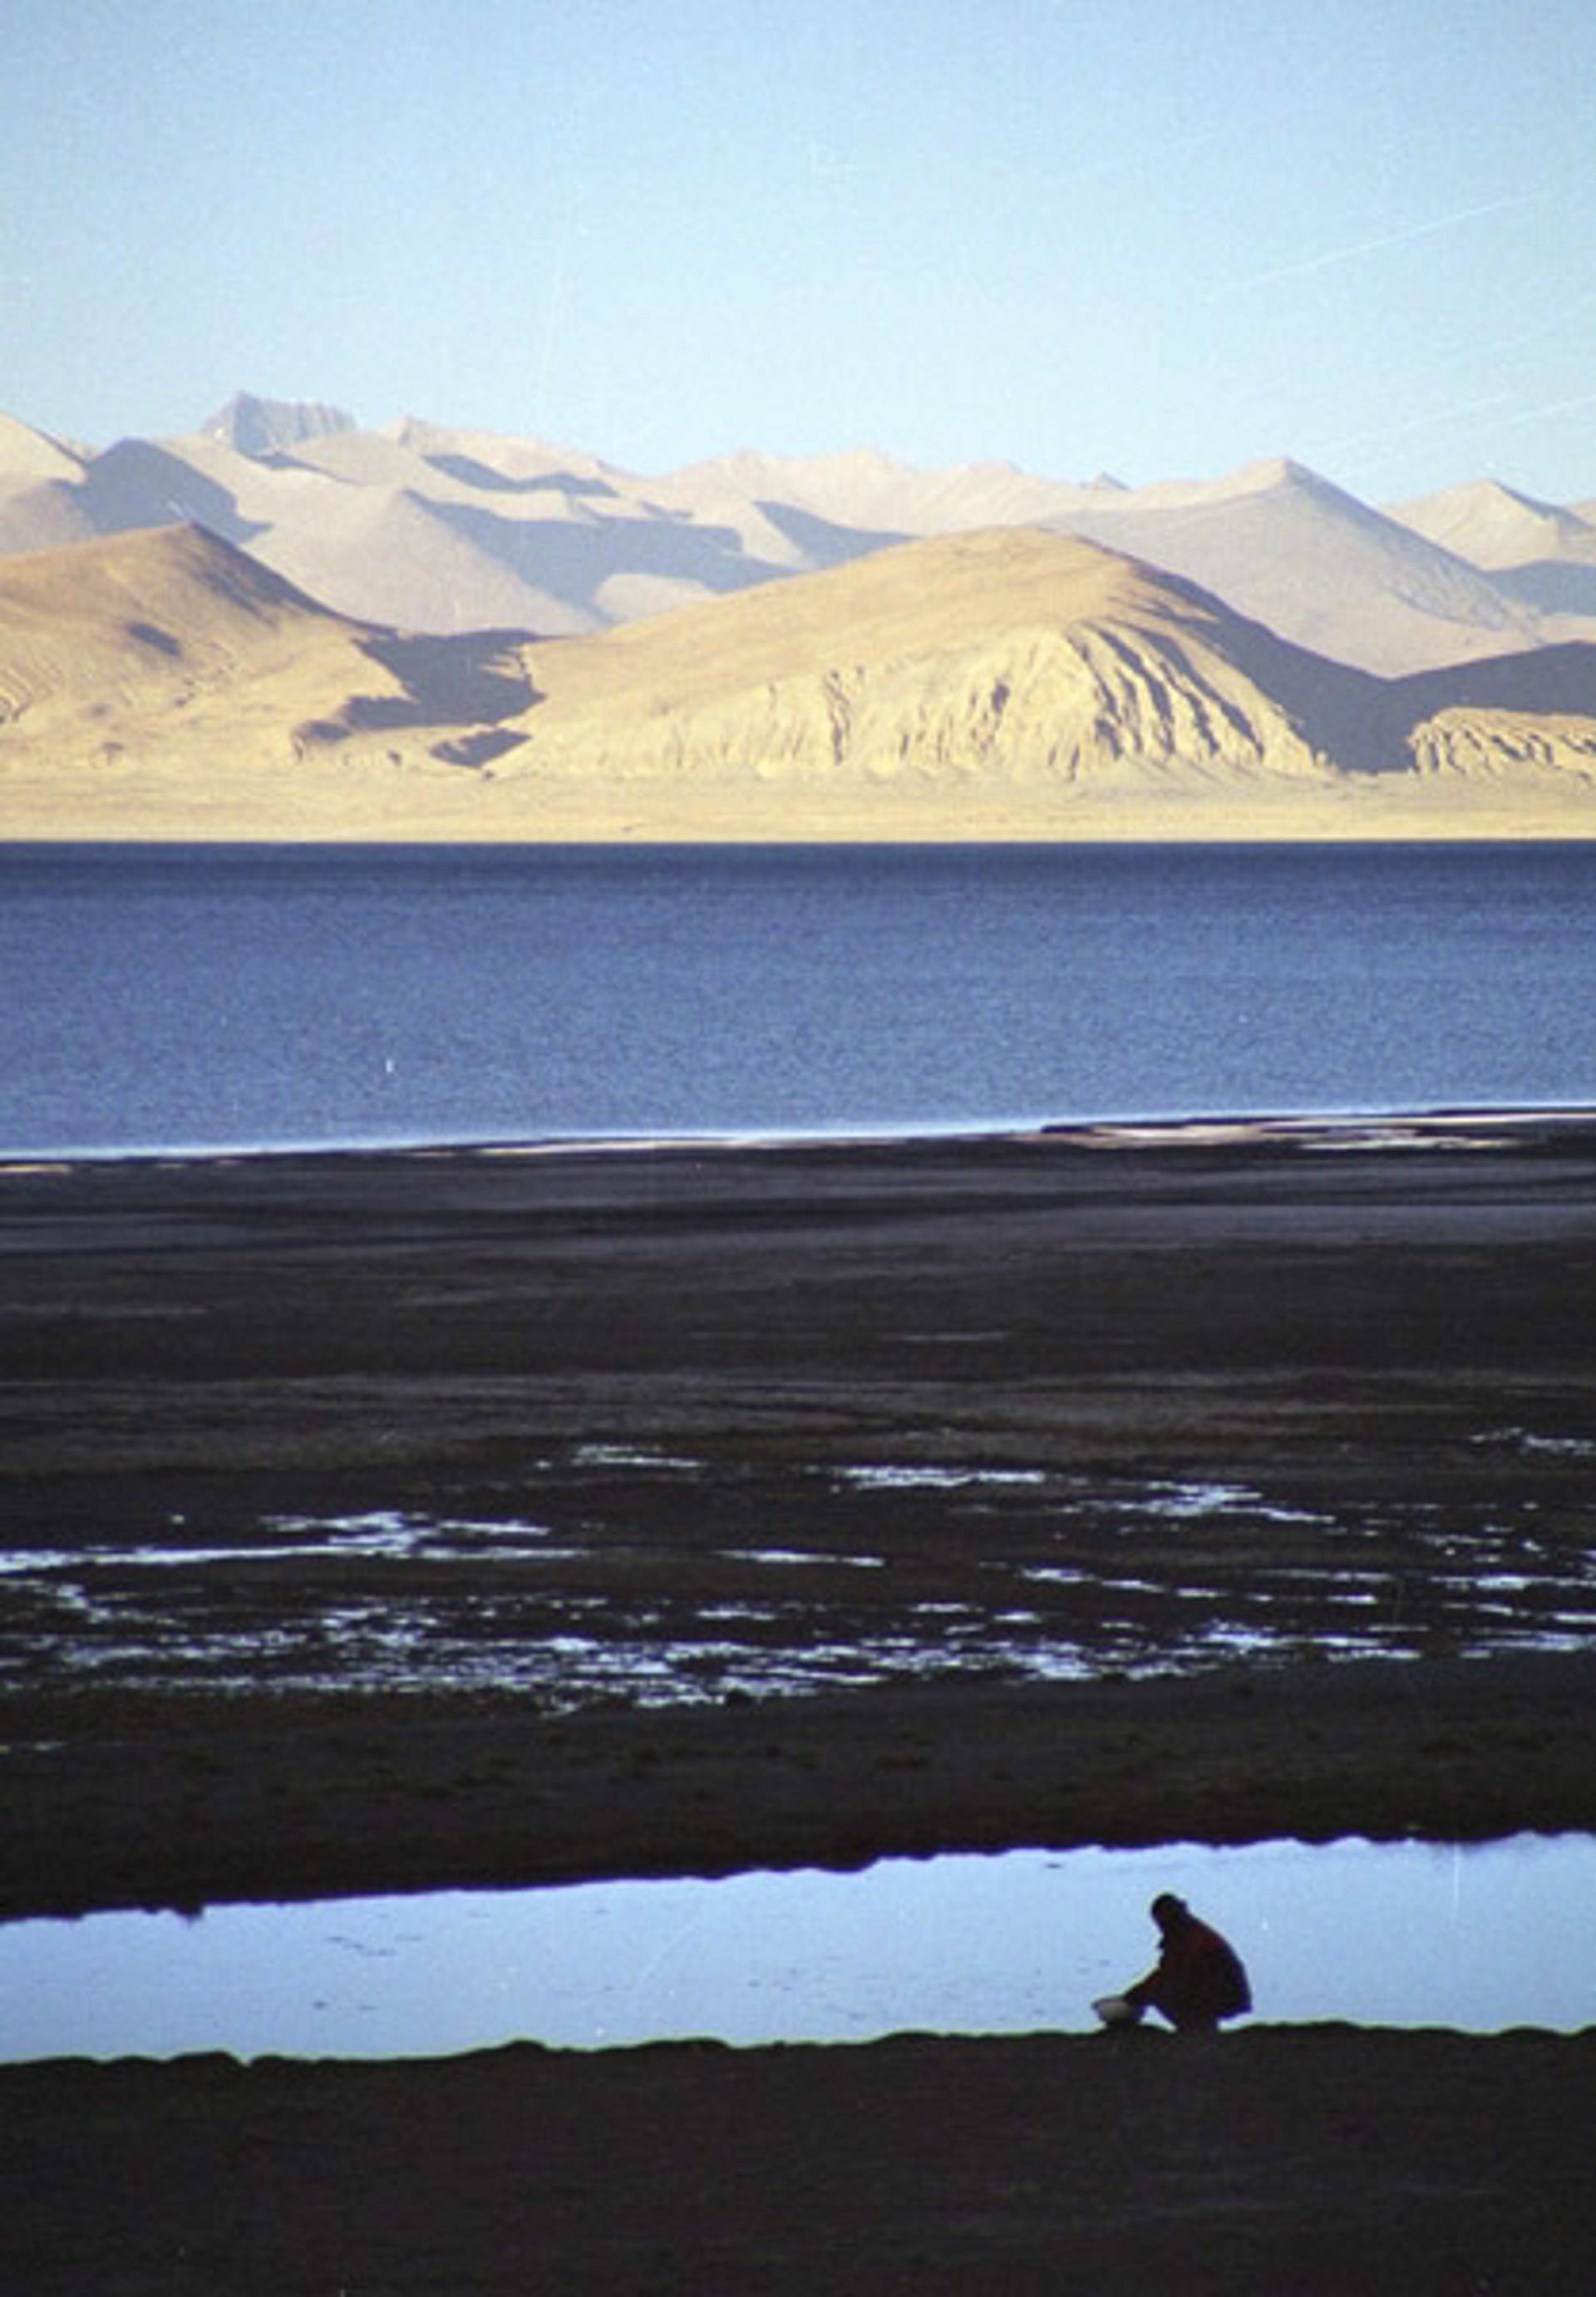 Making Camp, Peiku Tso, Tibet by Cora Edmonds